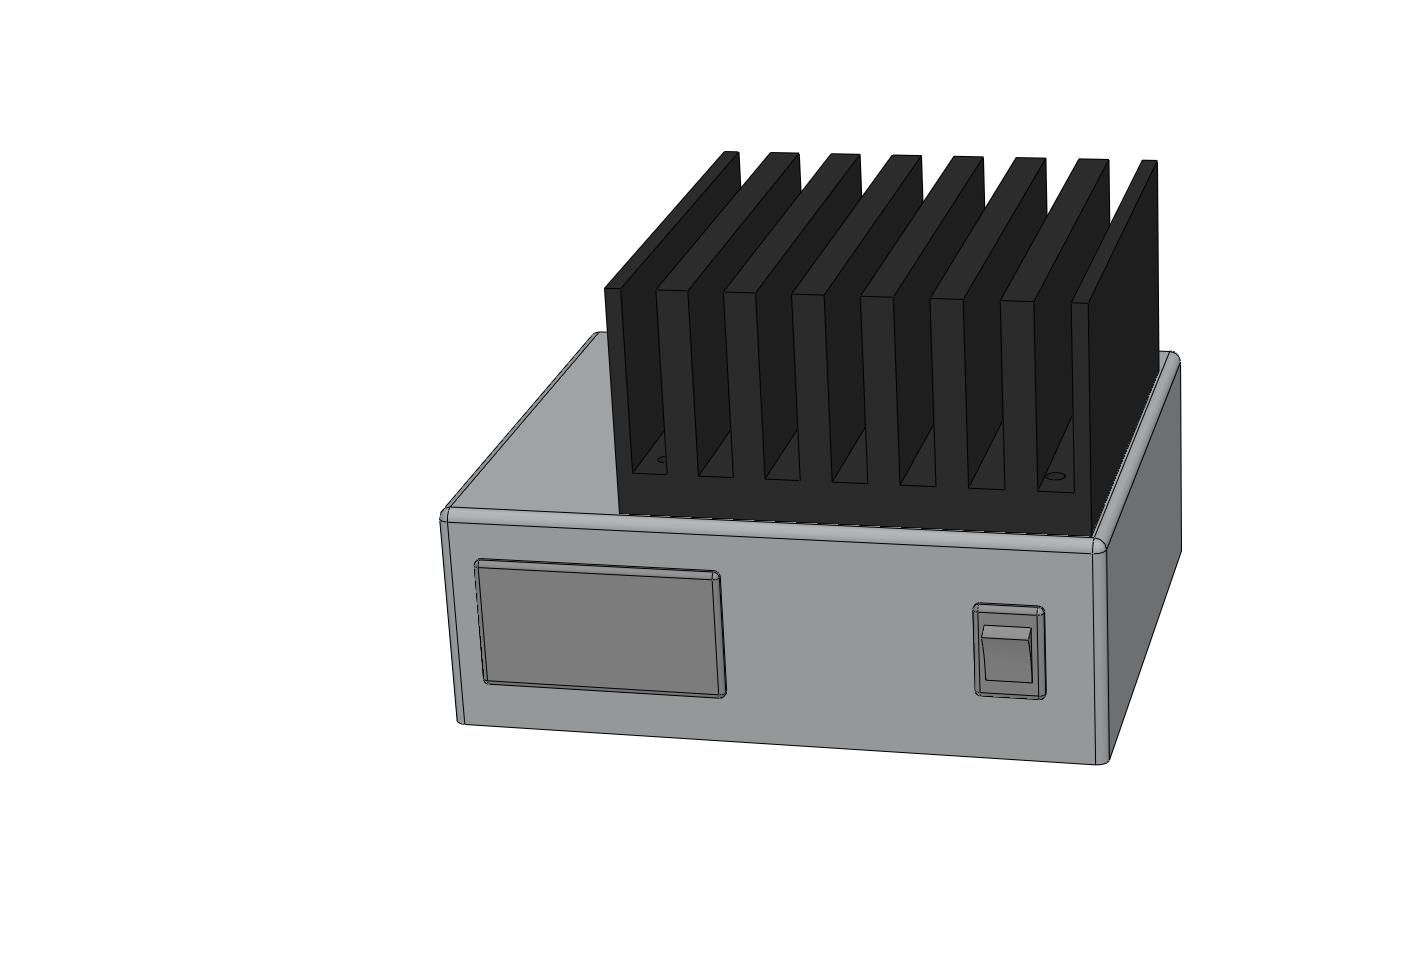 Auber Instruments Pid Amazon Com Temperature Control Controller 2362 Wiring Diagram Www